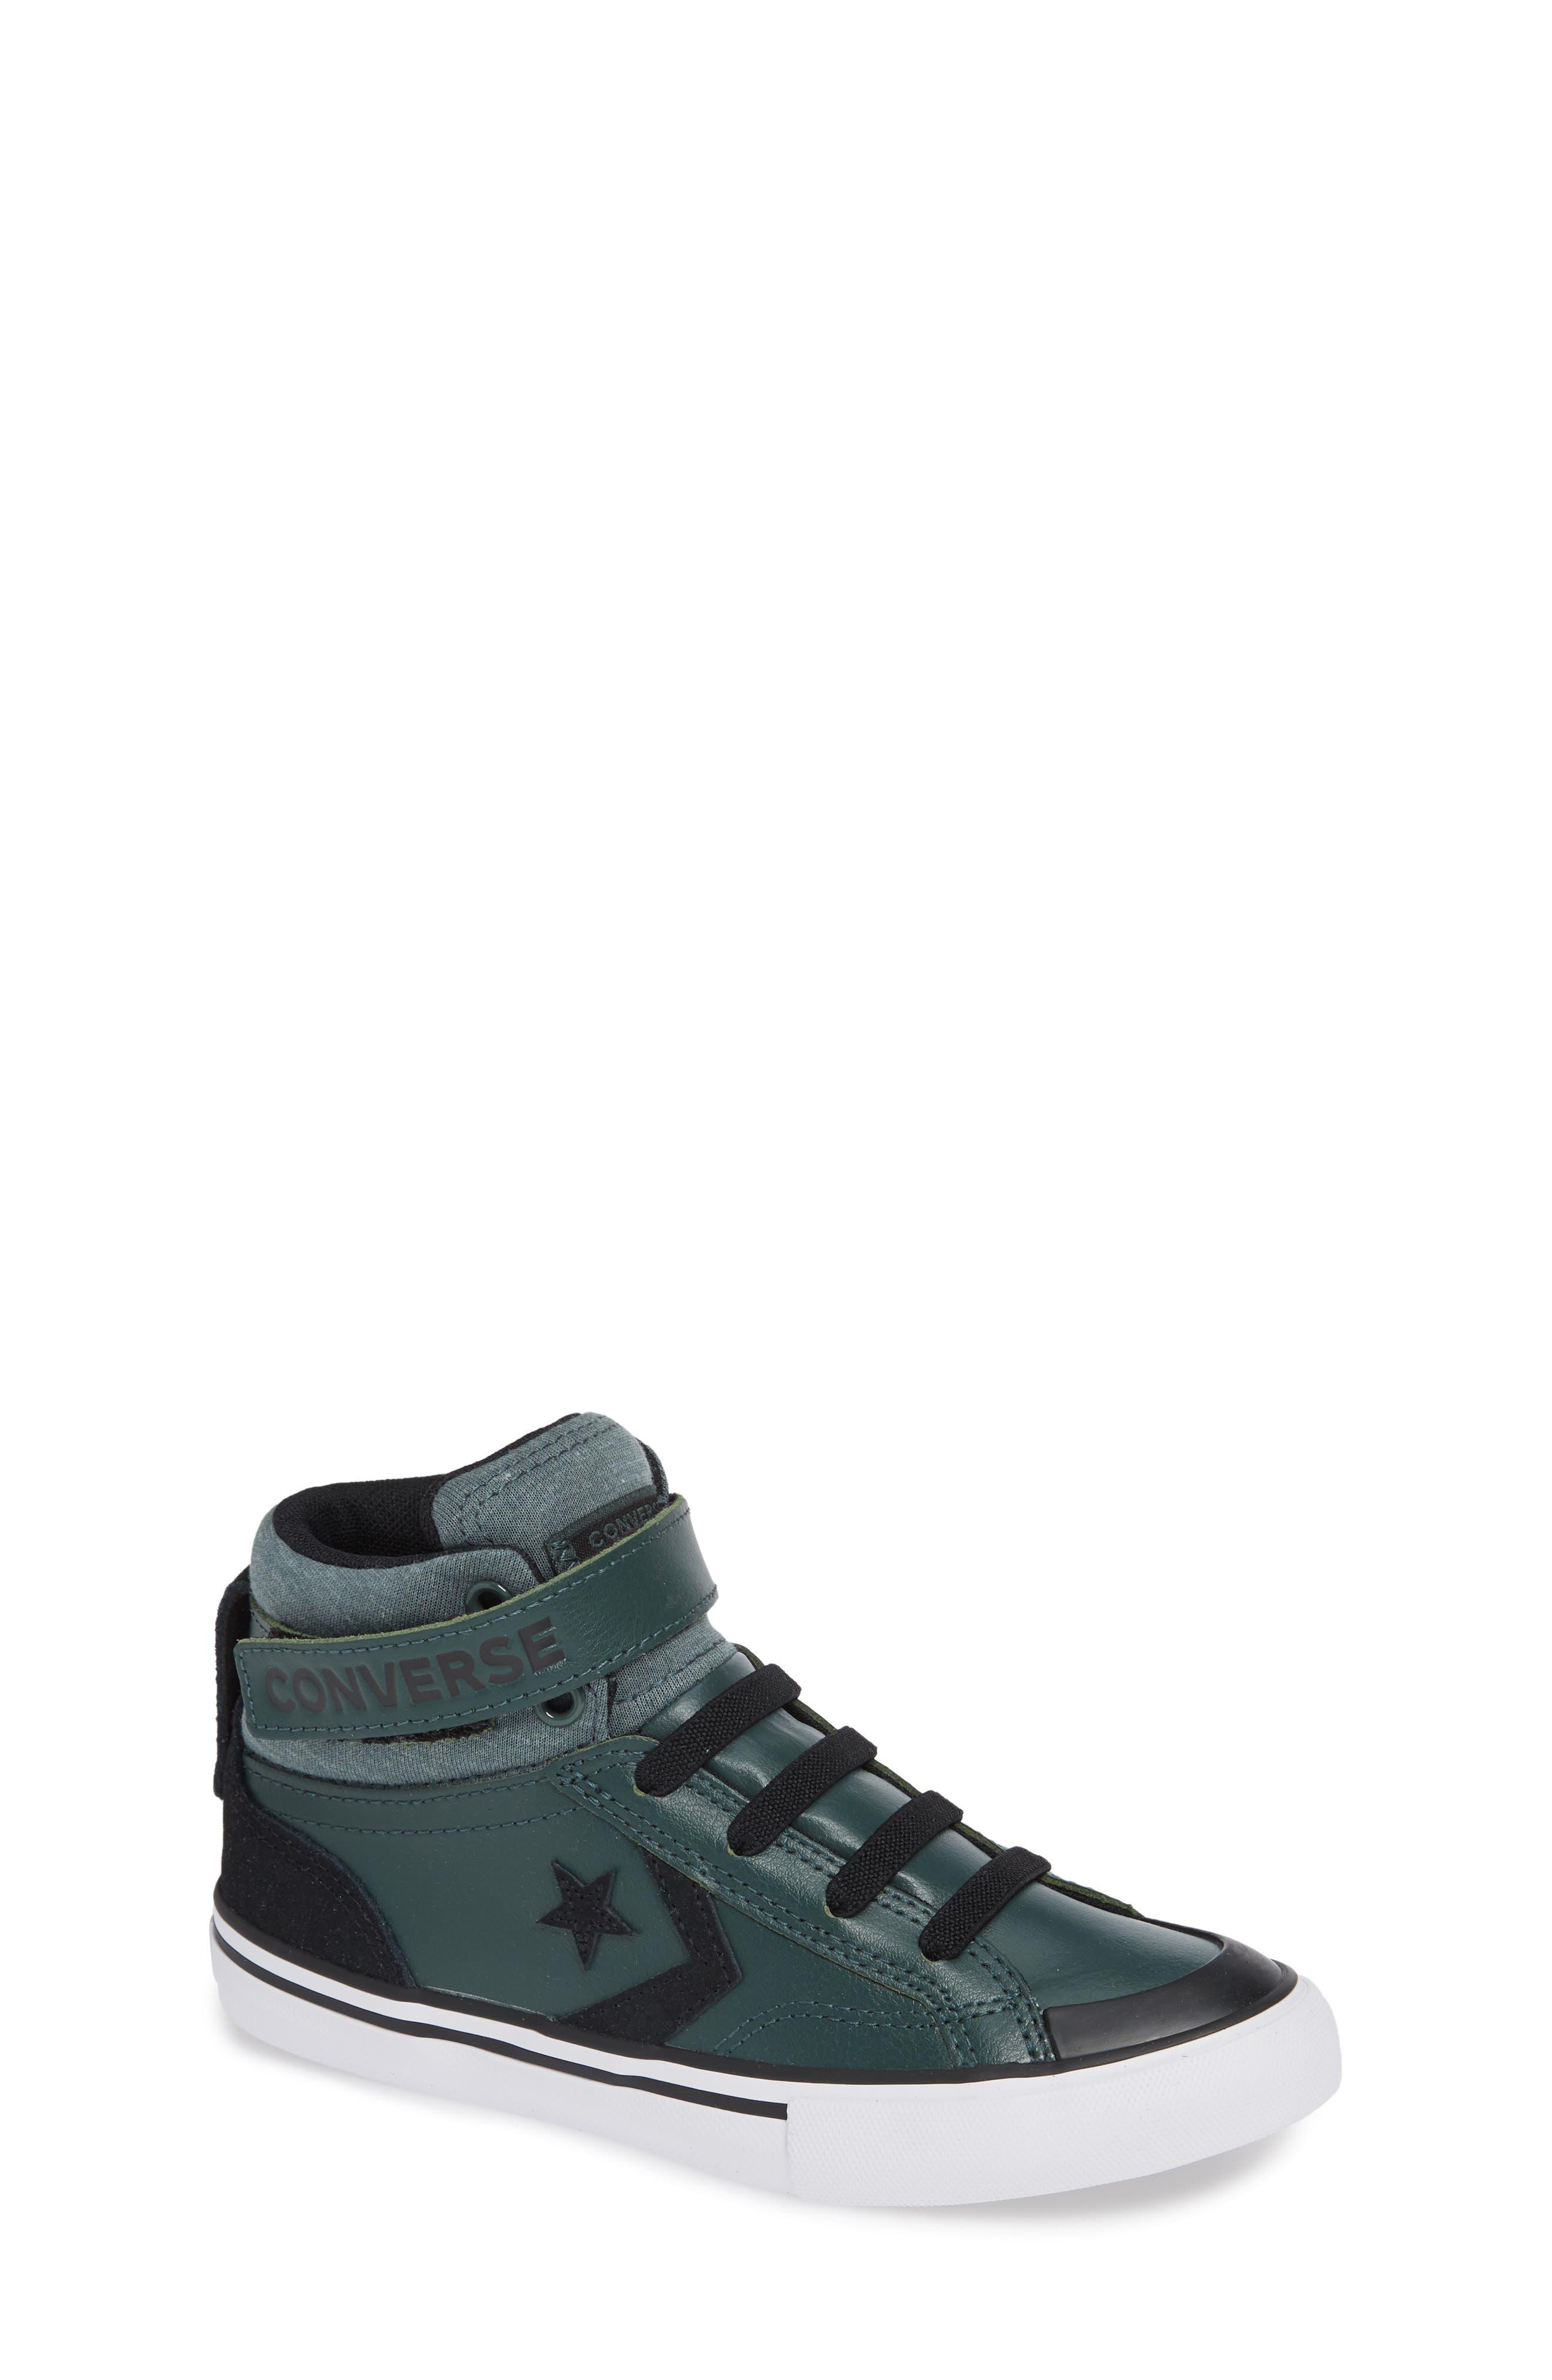 Pro Blaze High Top Sneaker,                         Main,                         color, VINTAGE GREEN